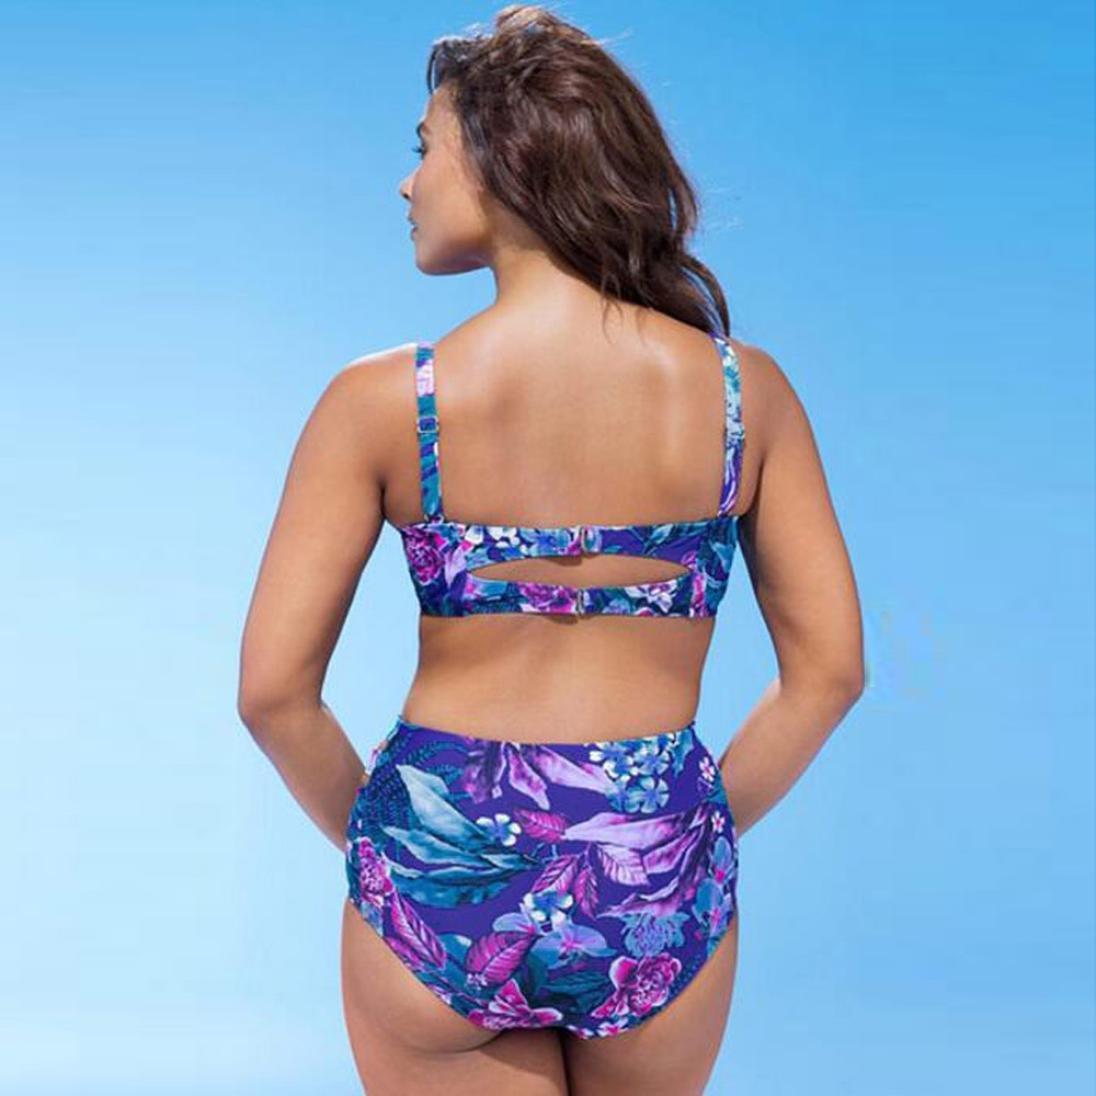 b4c1bf4e654 Amazon.com  Inverlee Plus Size Womens Swimming Push up Padded Swimsuit  Monokini Swimwear Bikini Bathing Suit  Clothing